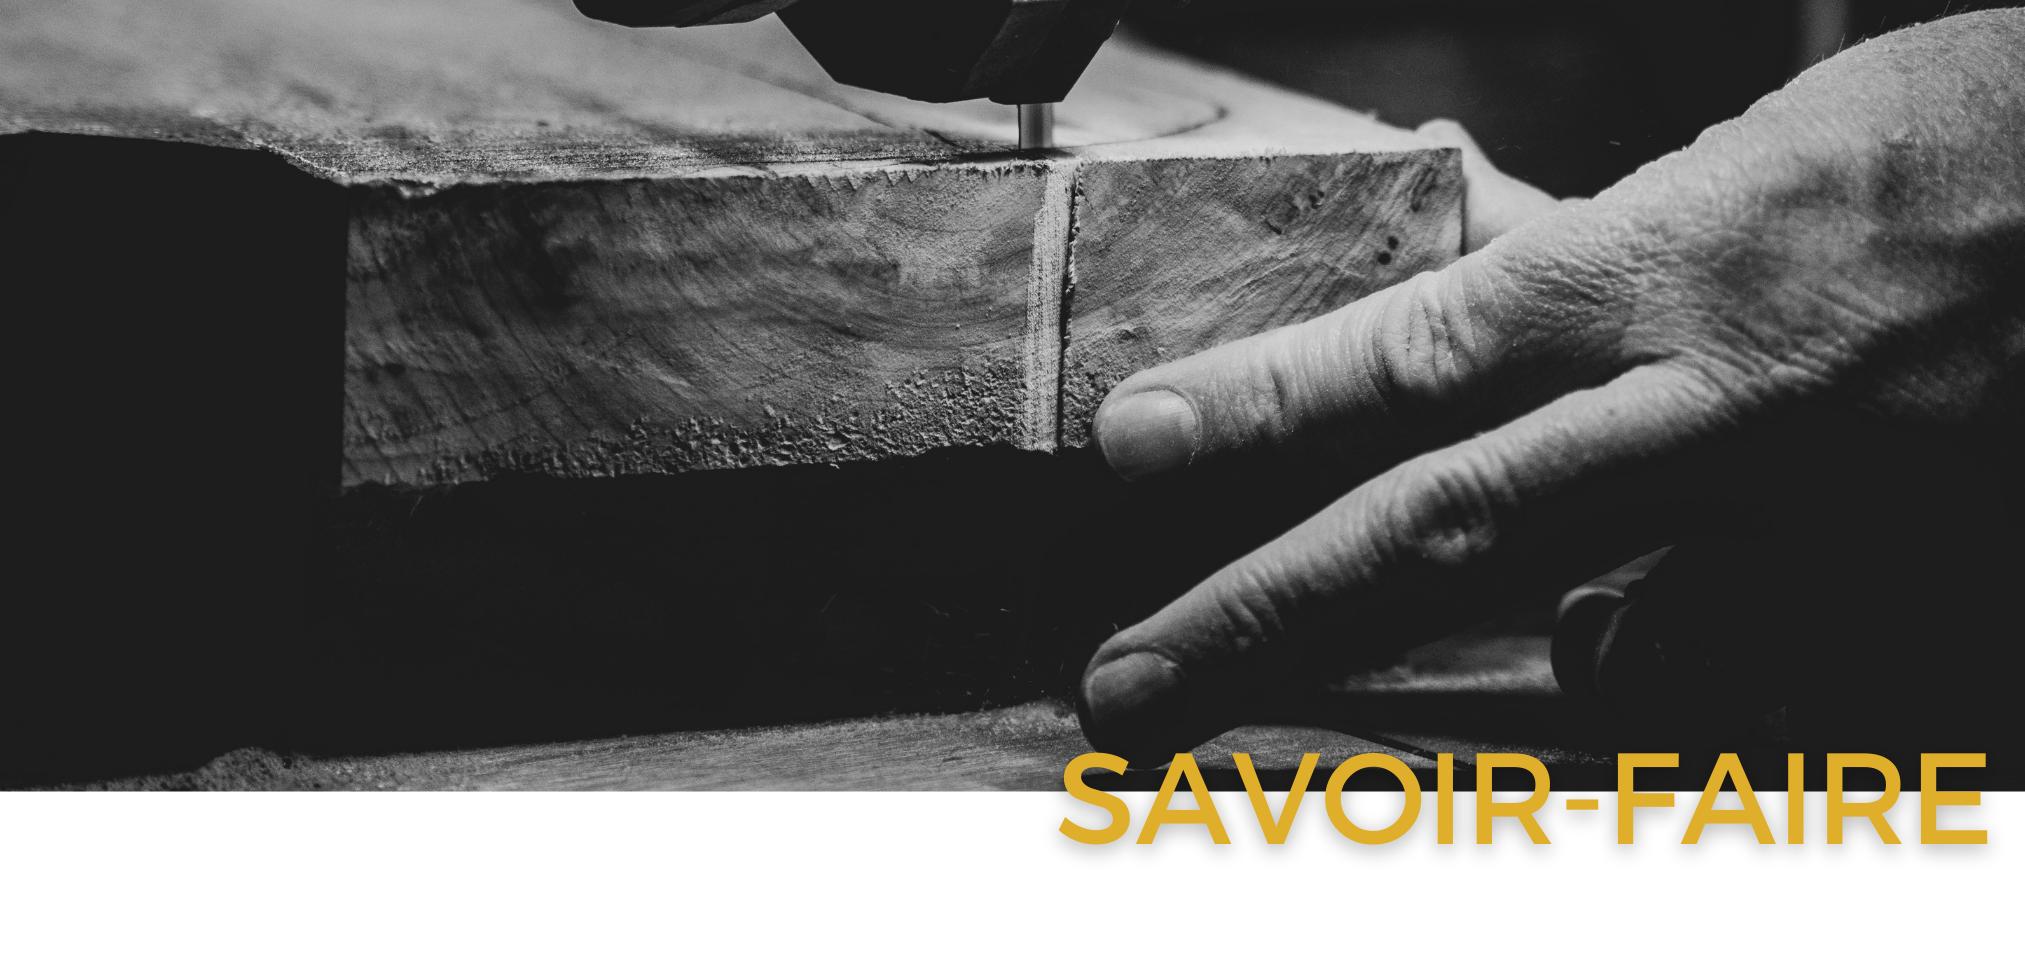 Binova & Armony cuisine - Showroom La Garenne Colombes - bandeau savoir-faire